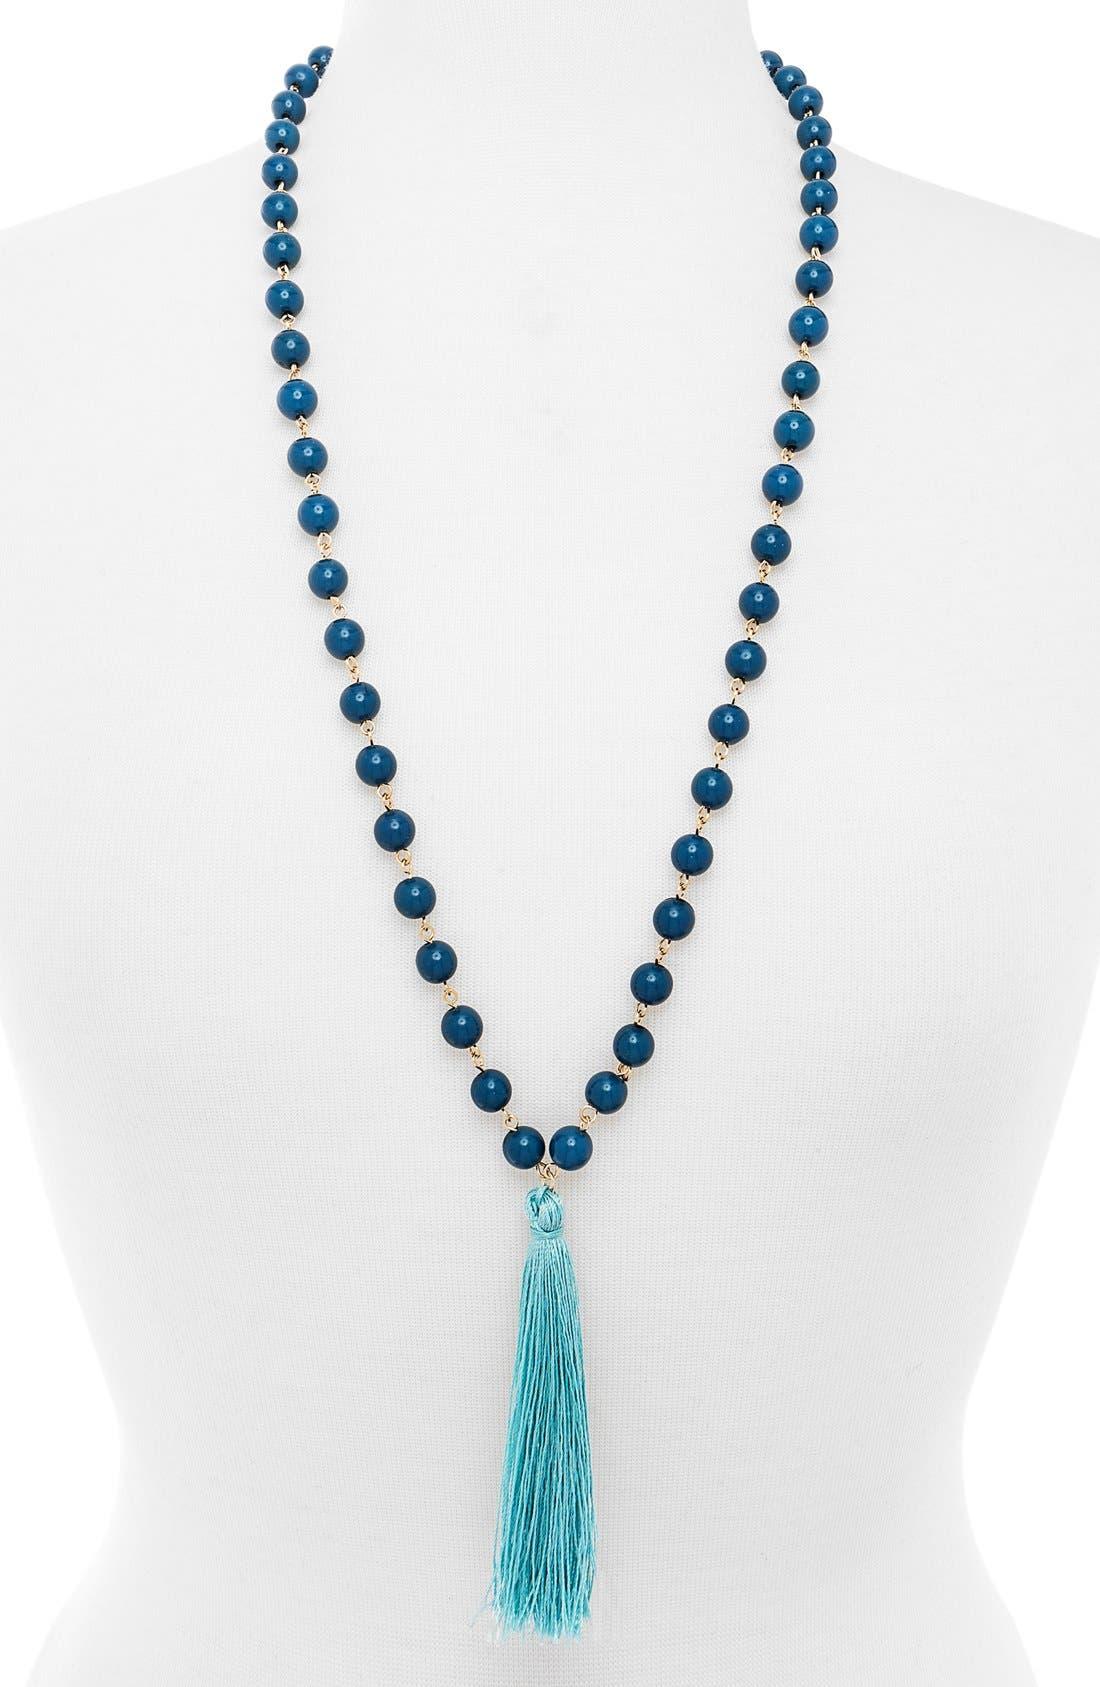 Main Image - BaubleBar 'Bali' Tassel Pendant Necklace